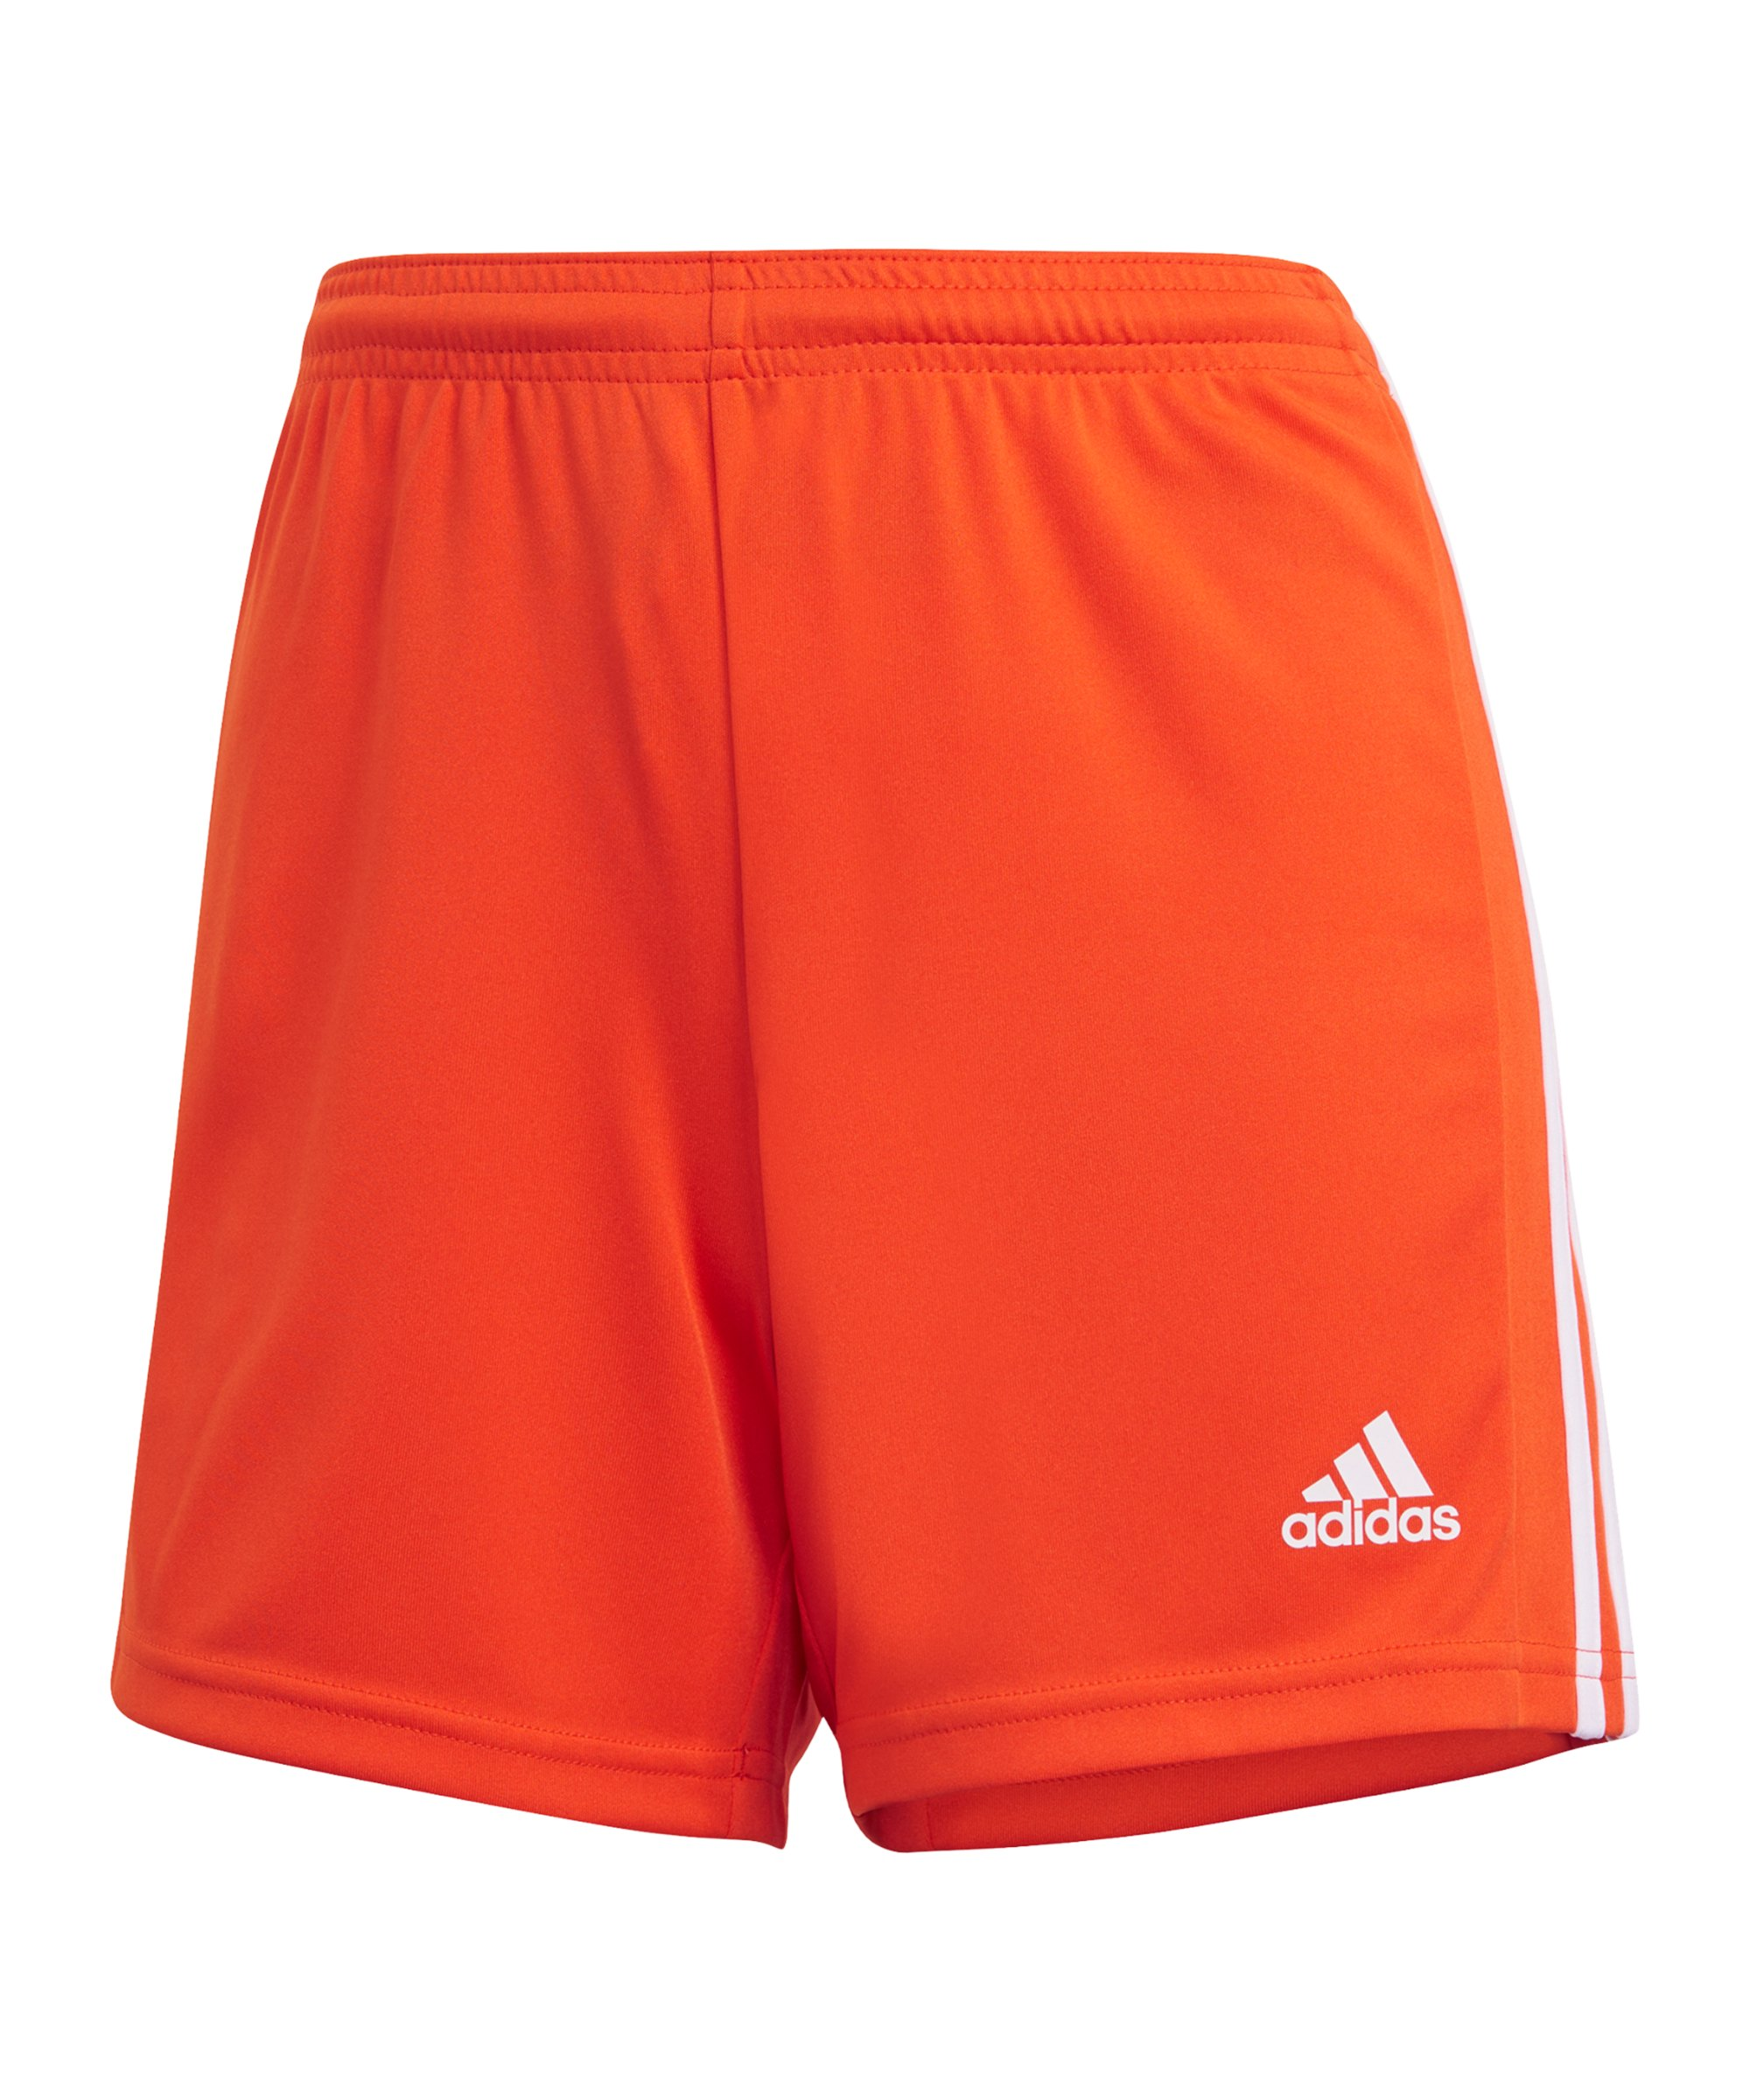 adidas Squadra 21 Short Damen Orange Weiss - orange